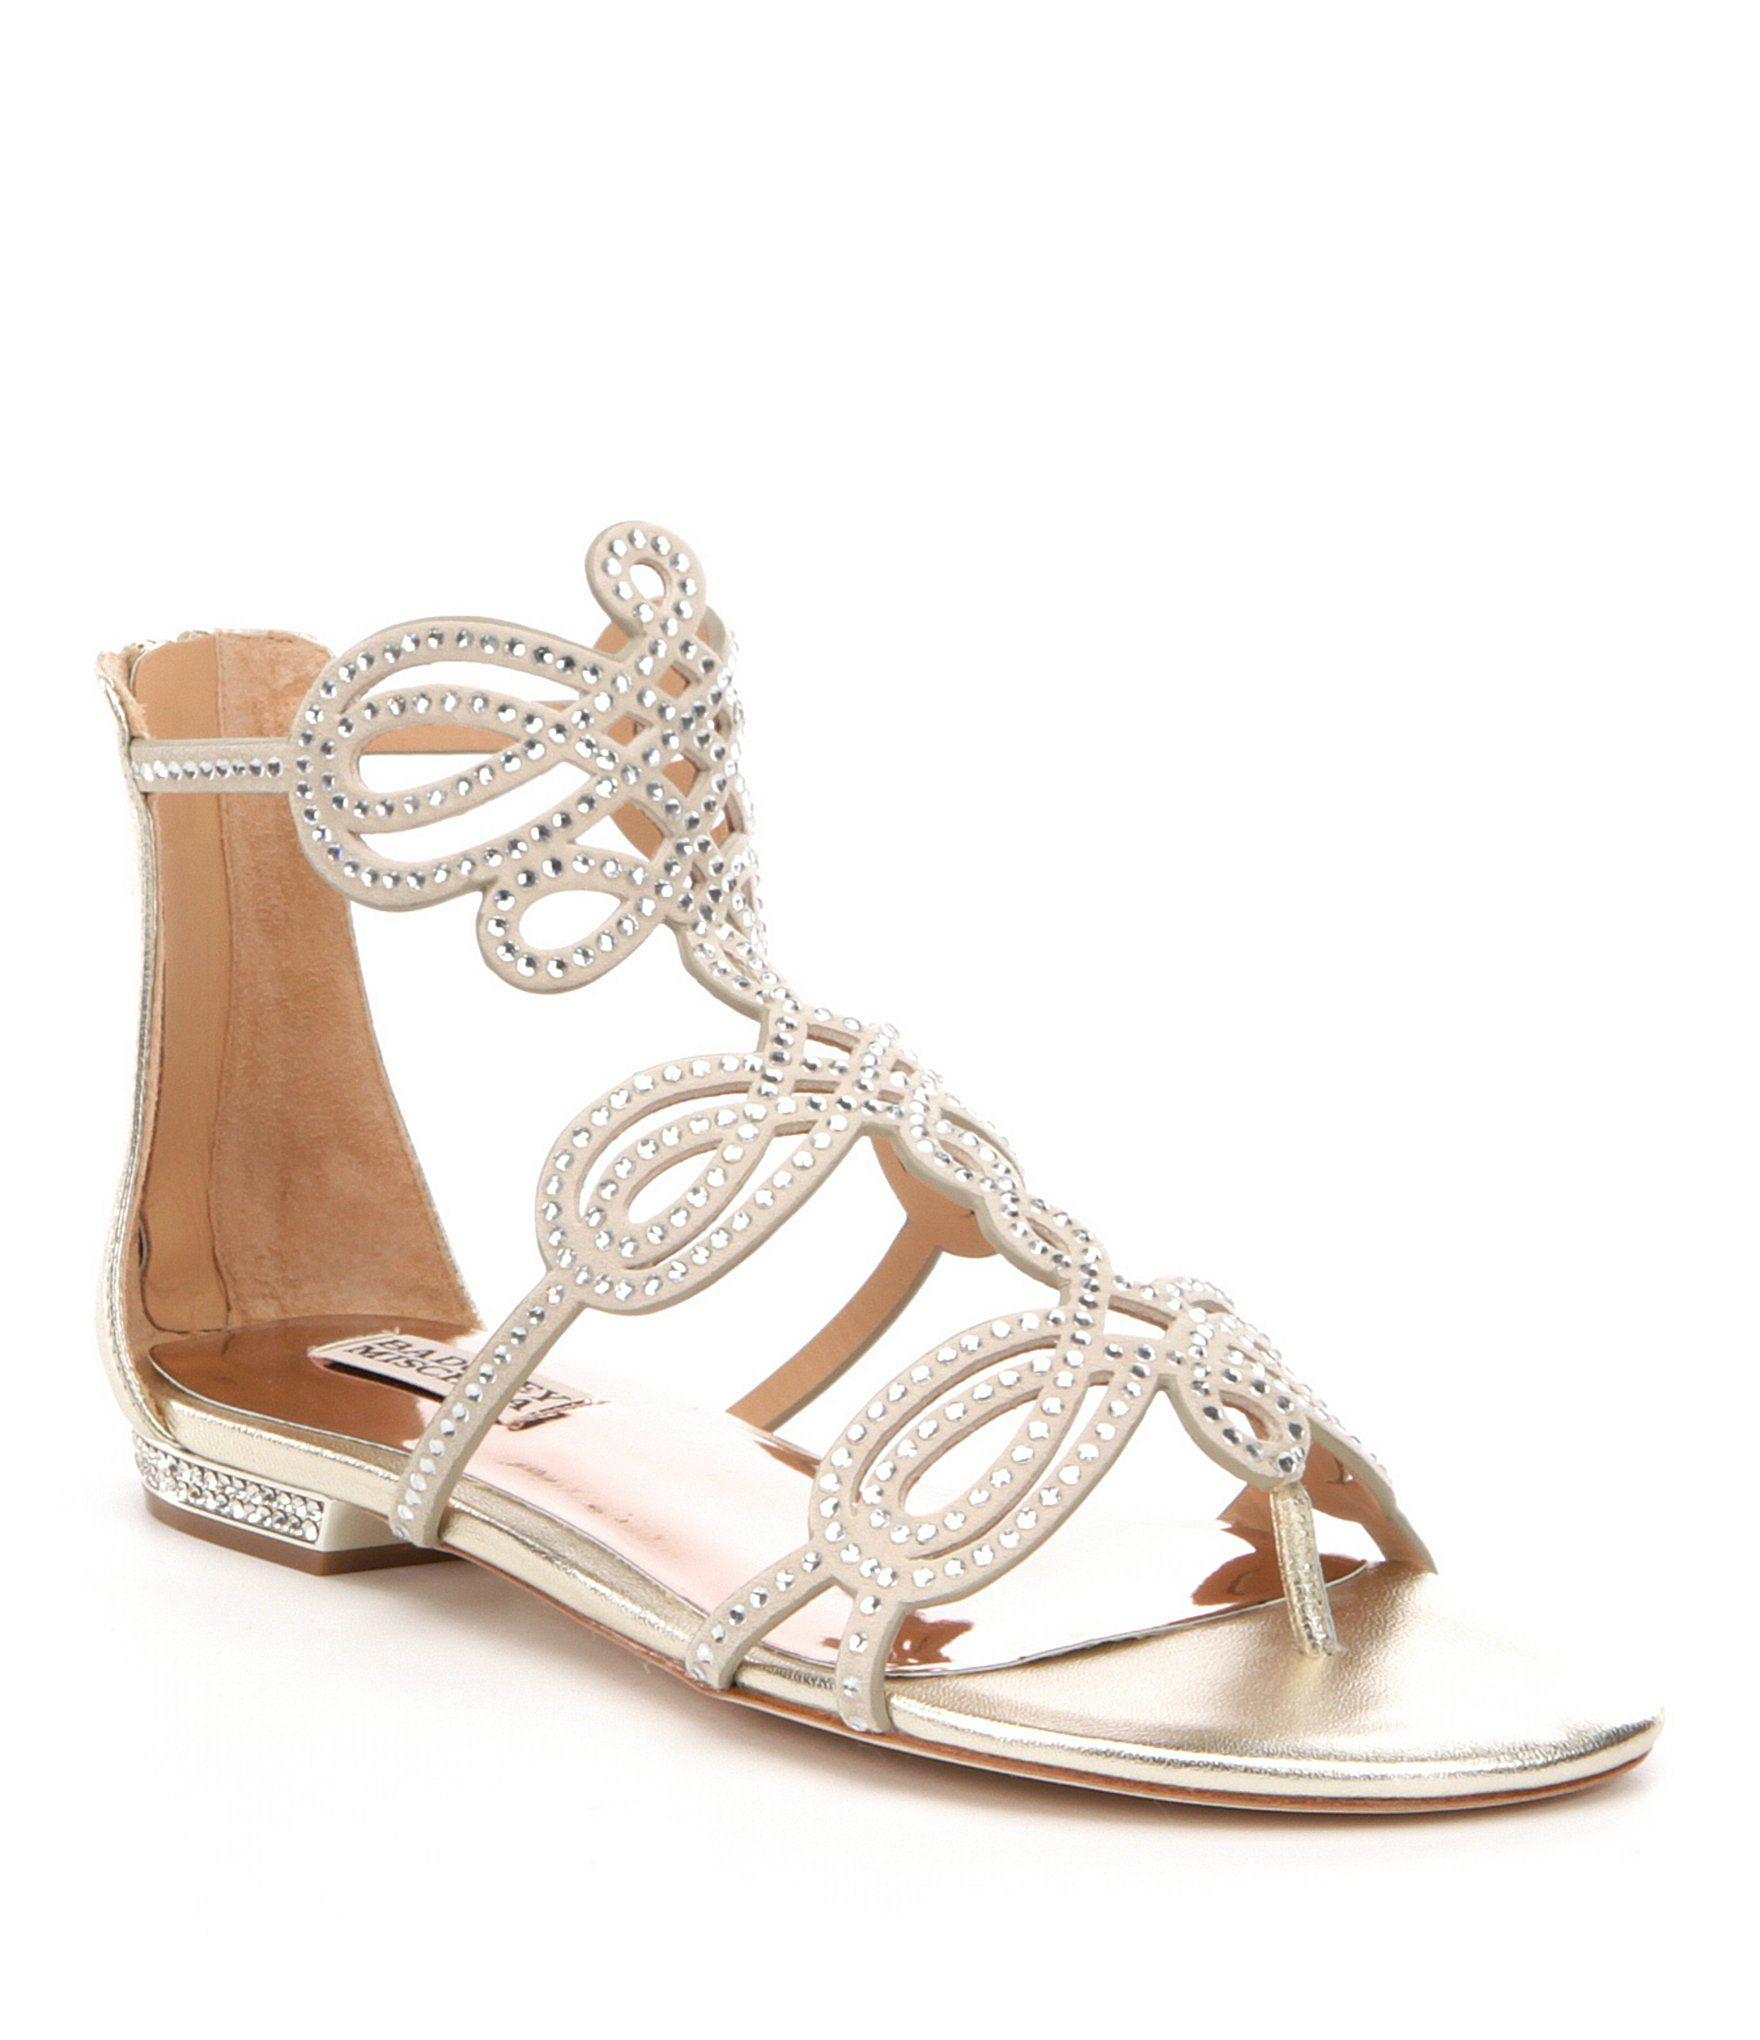 Badgley Mischka Tempe Jeweled Suede & Metallic Leather Flat Dress Sandals. Shoes  Women ...